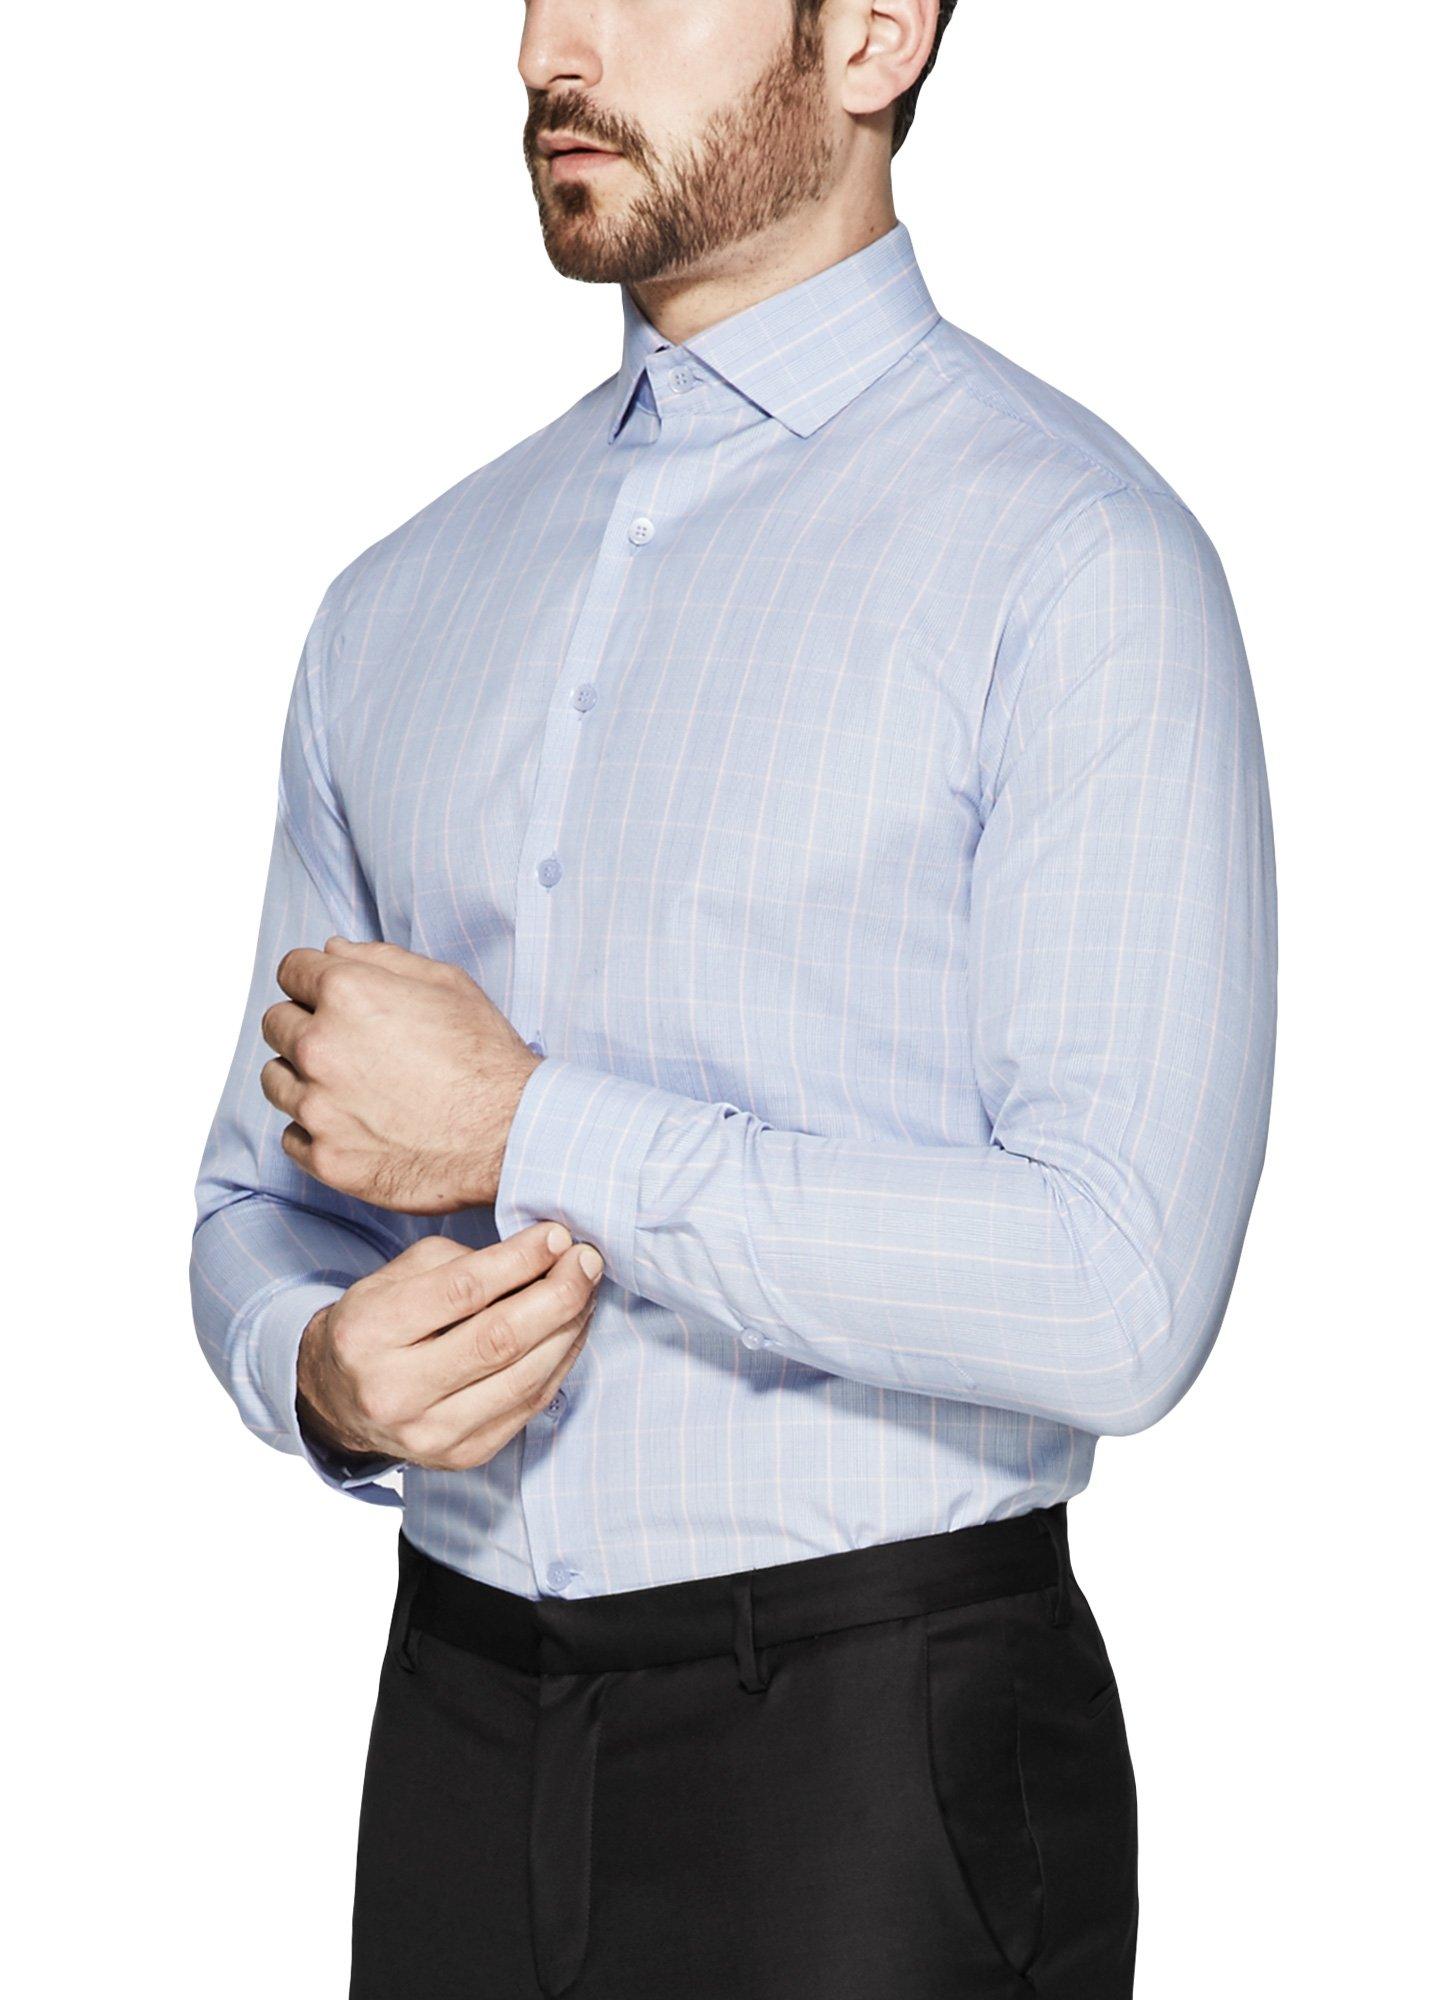 Vardama Men's Performance Formal Shirt With Sweat Proof Technology Blue Pink Windowpane Checks Fulton (Large)